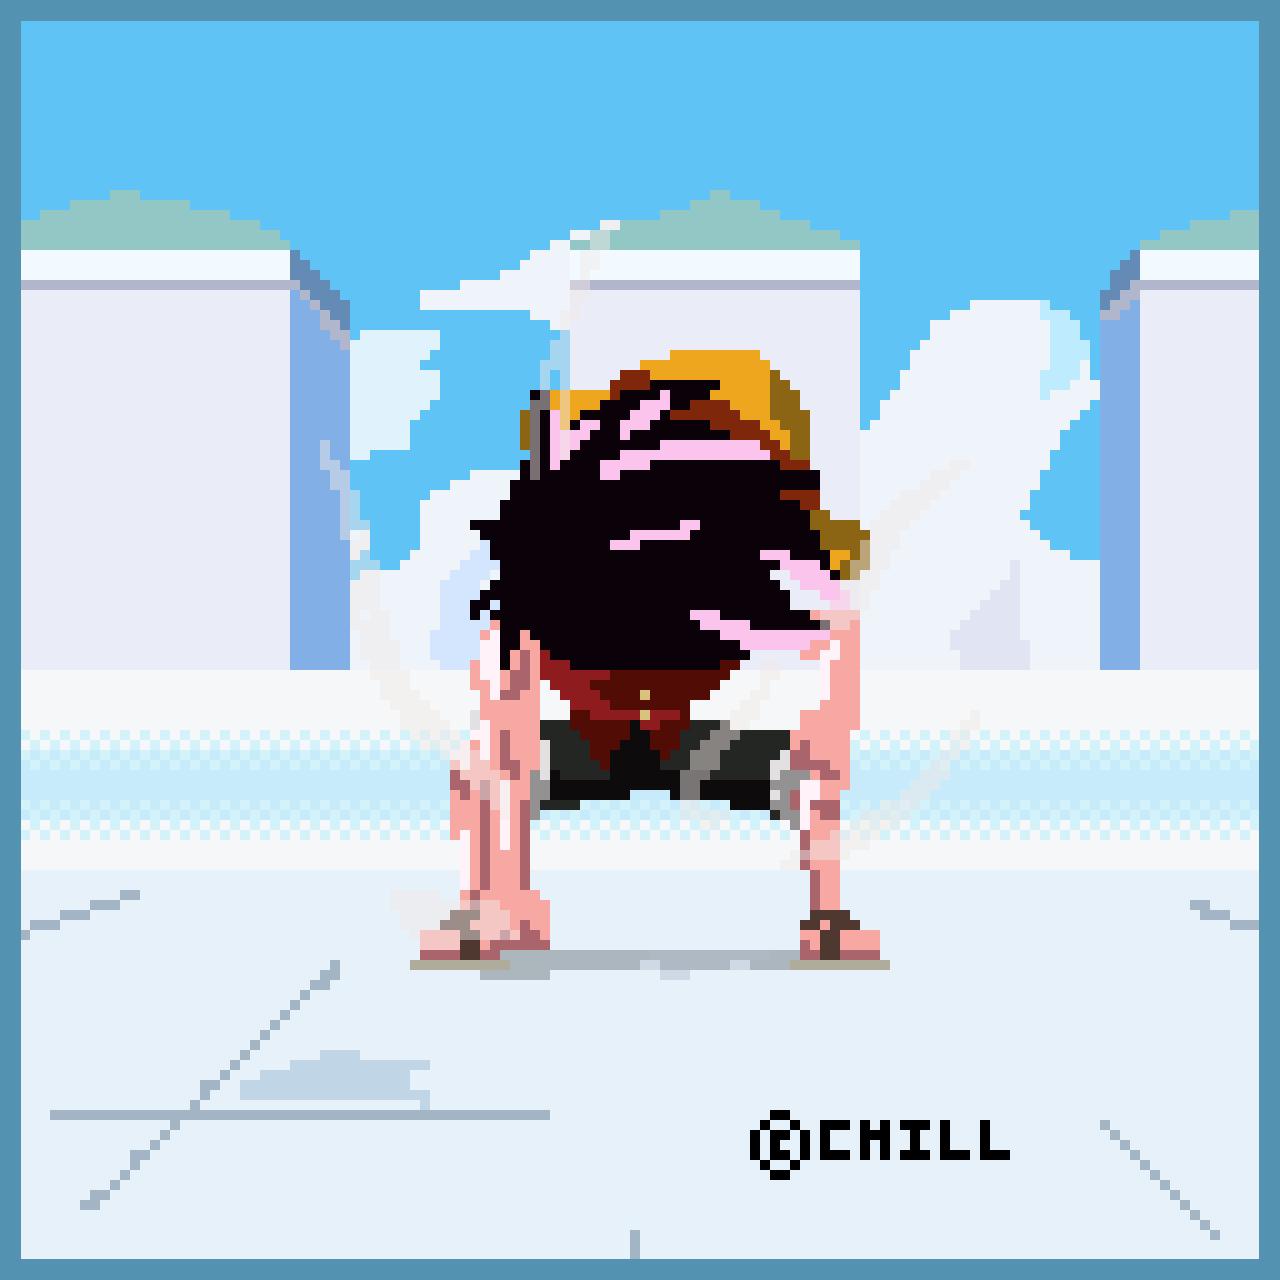 Luffy Gear Second Pixel Art by RubidiumHawk